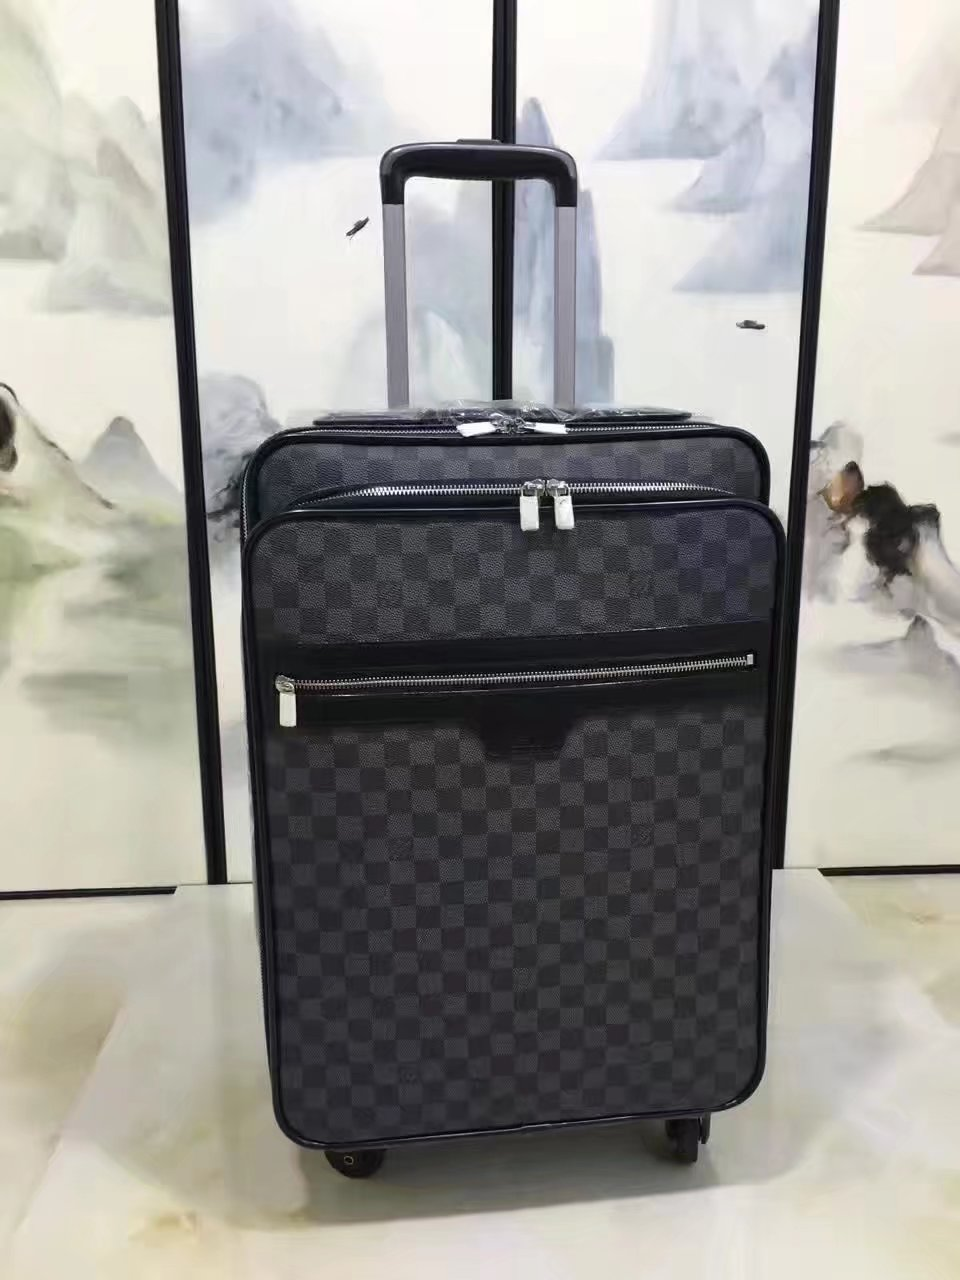 Louis Vuitton 55 Luggage Damier Graphite Canvas